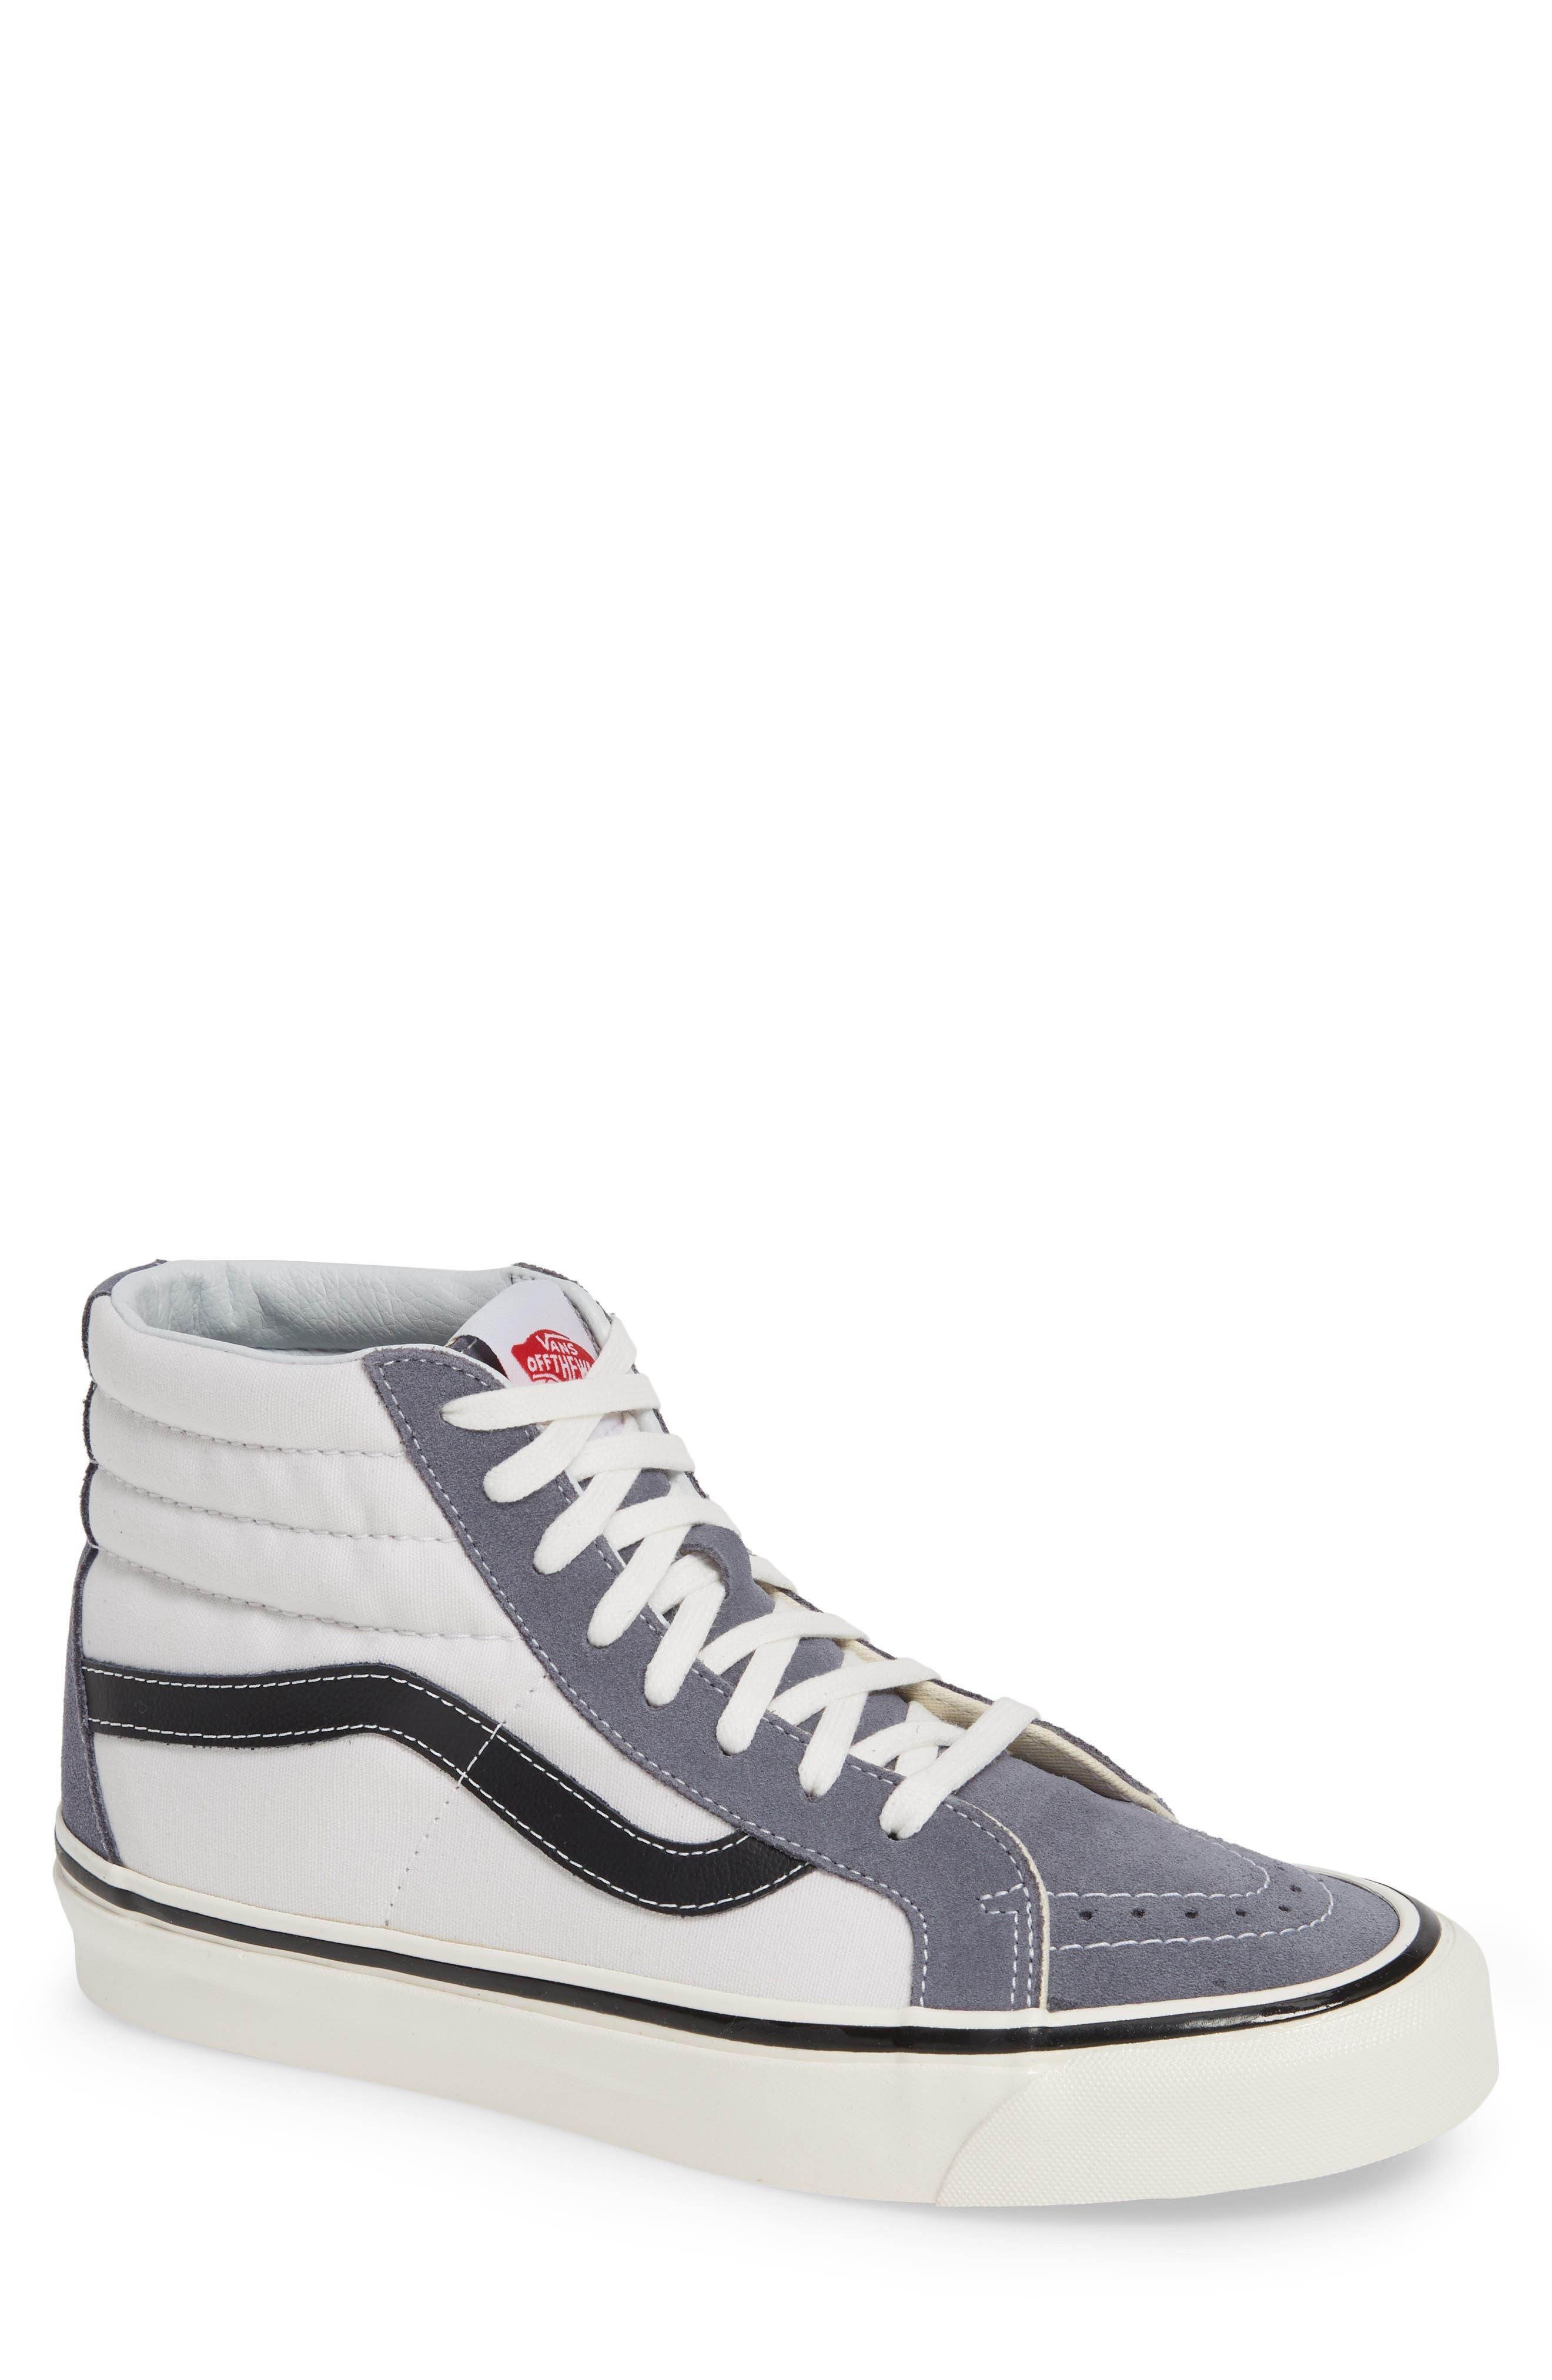 UA Sk8-Hi 38 DX Sneaker,                             Main thumbnail 1, color,                             DARK GREY/ WHITE